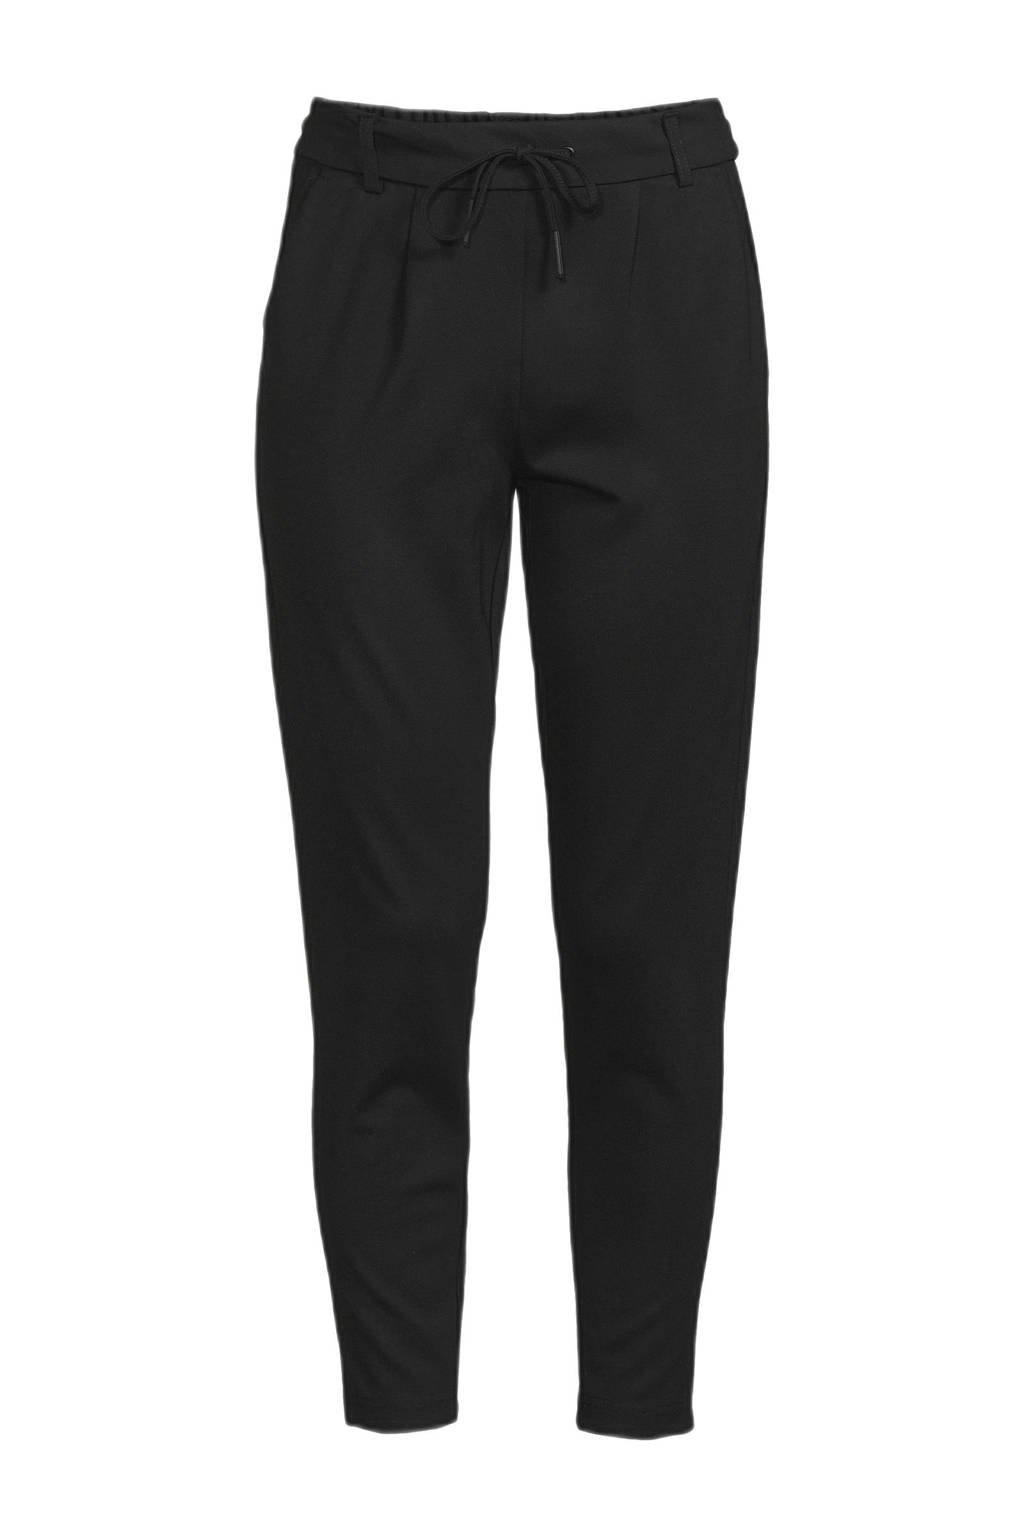 ONLY tapered fit broek ONLPOPTRASH zwart, Zwart